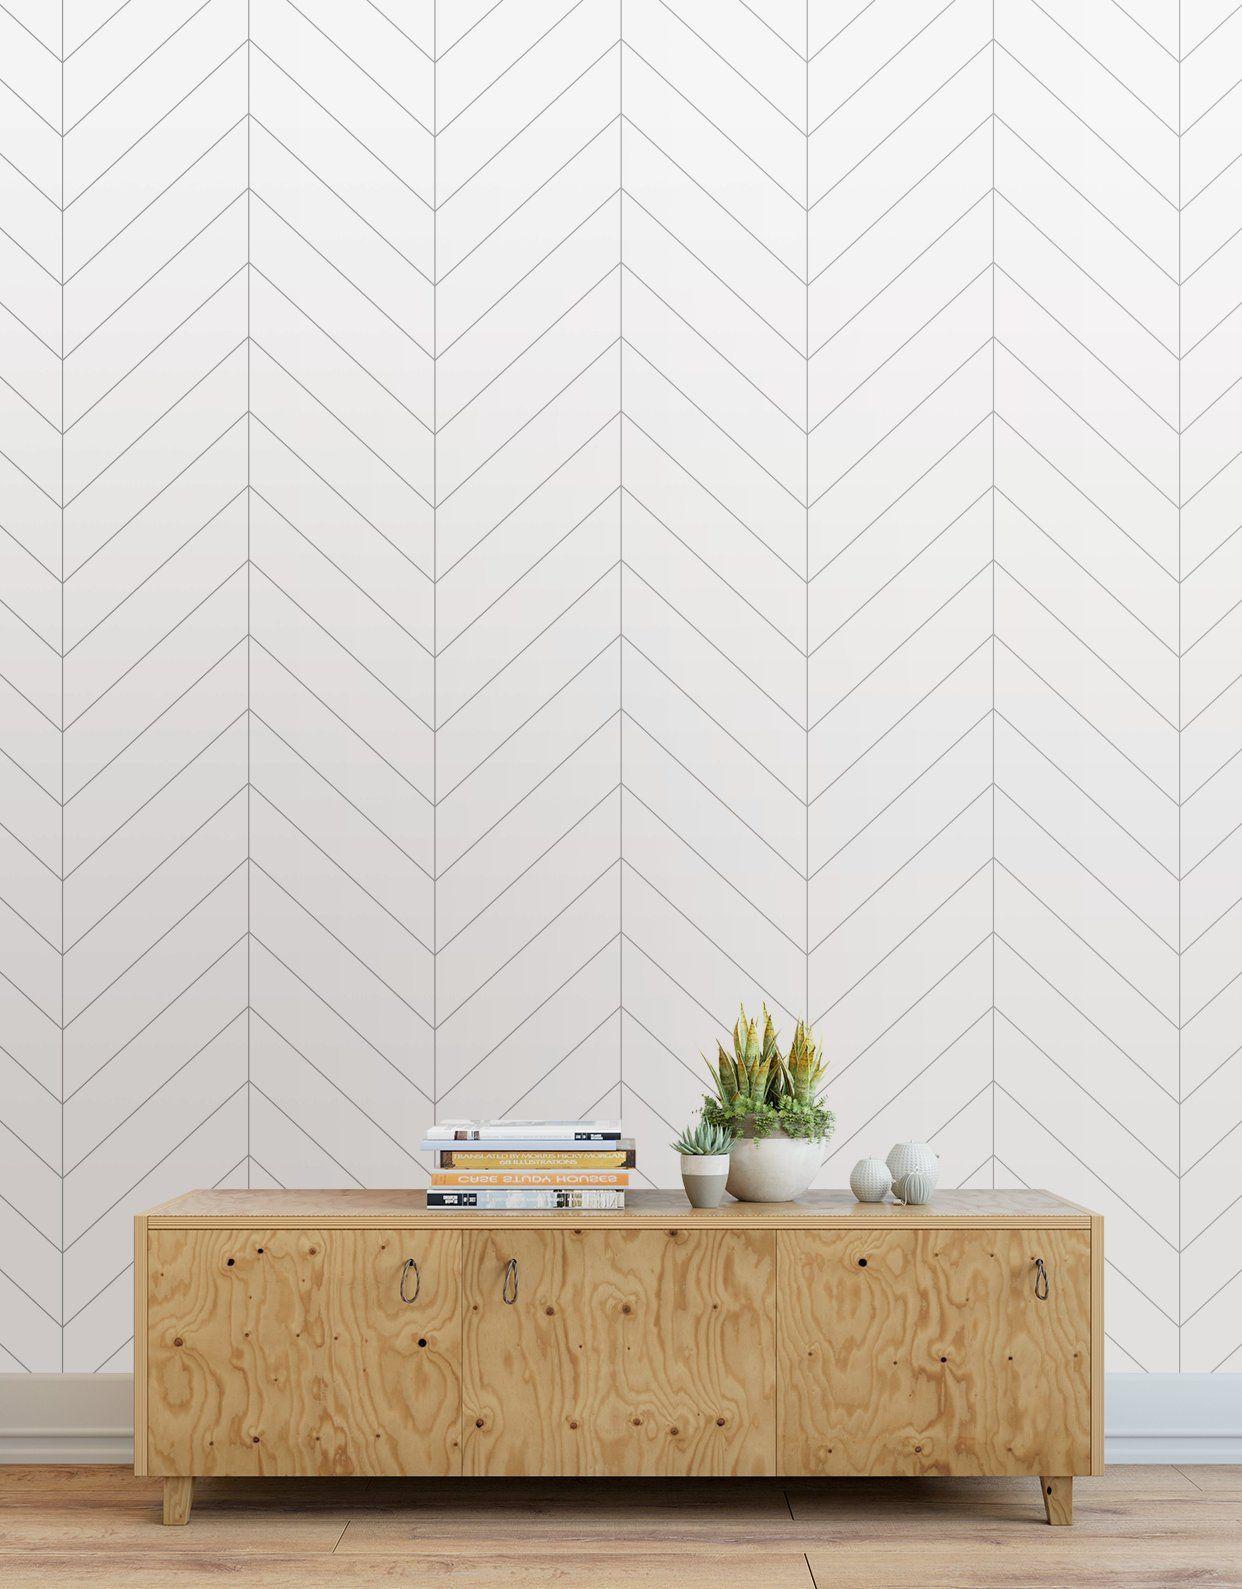 Herringbone Wallpaper Peel and Stick Tiles, Modern